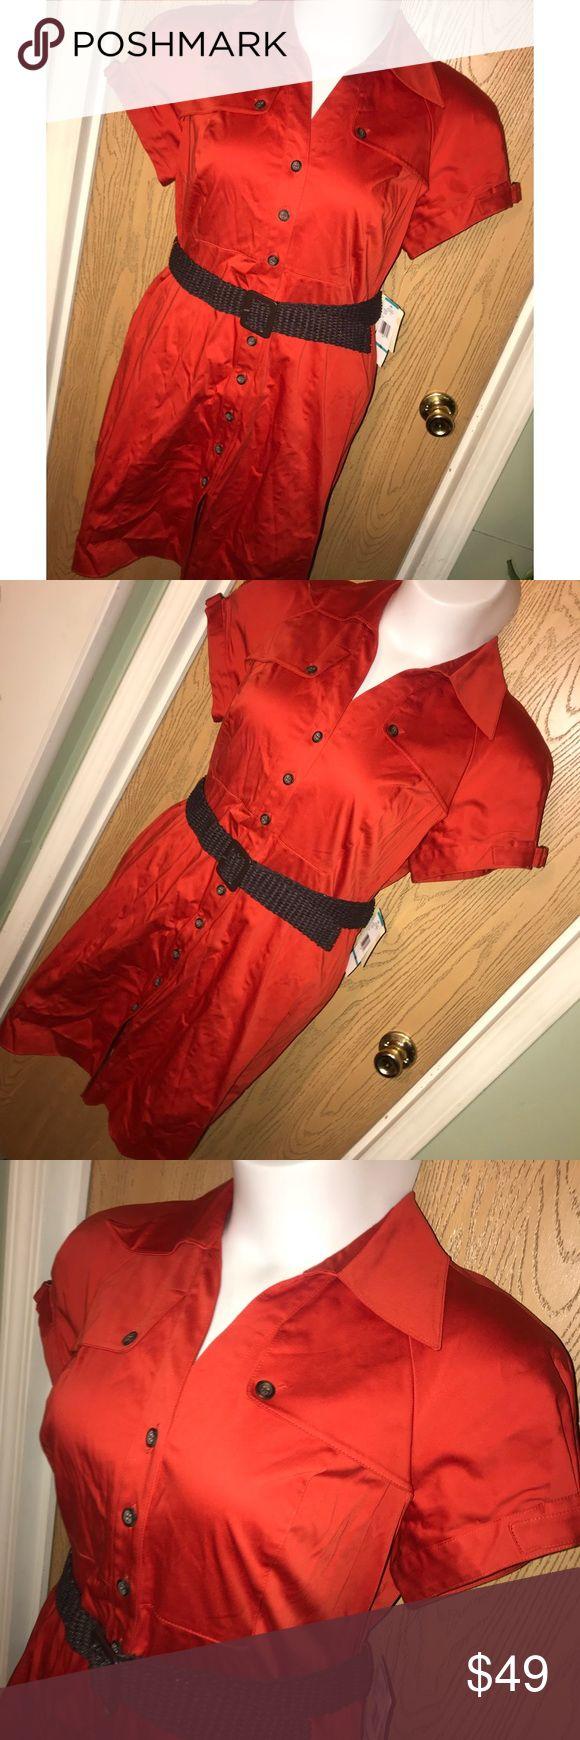 "Dark orange Nine West shirt dress Pretty dark orange button down shirt dress with woven belt. Never worn. 23"" from armpit to armpit, 38"" total length. Nine West Dresses"